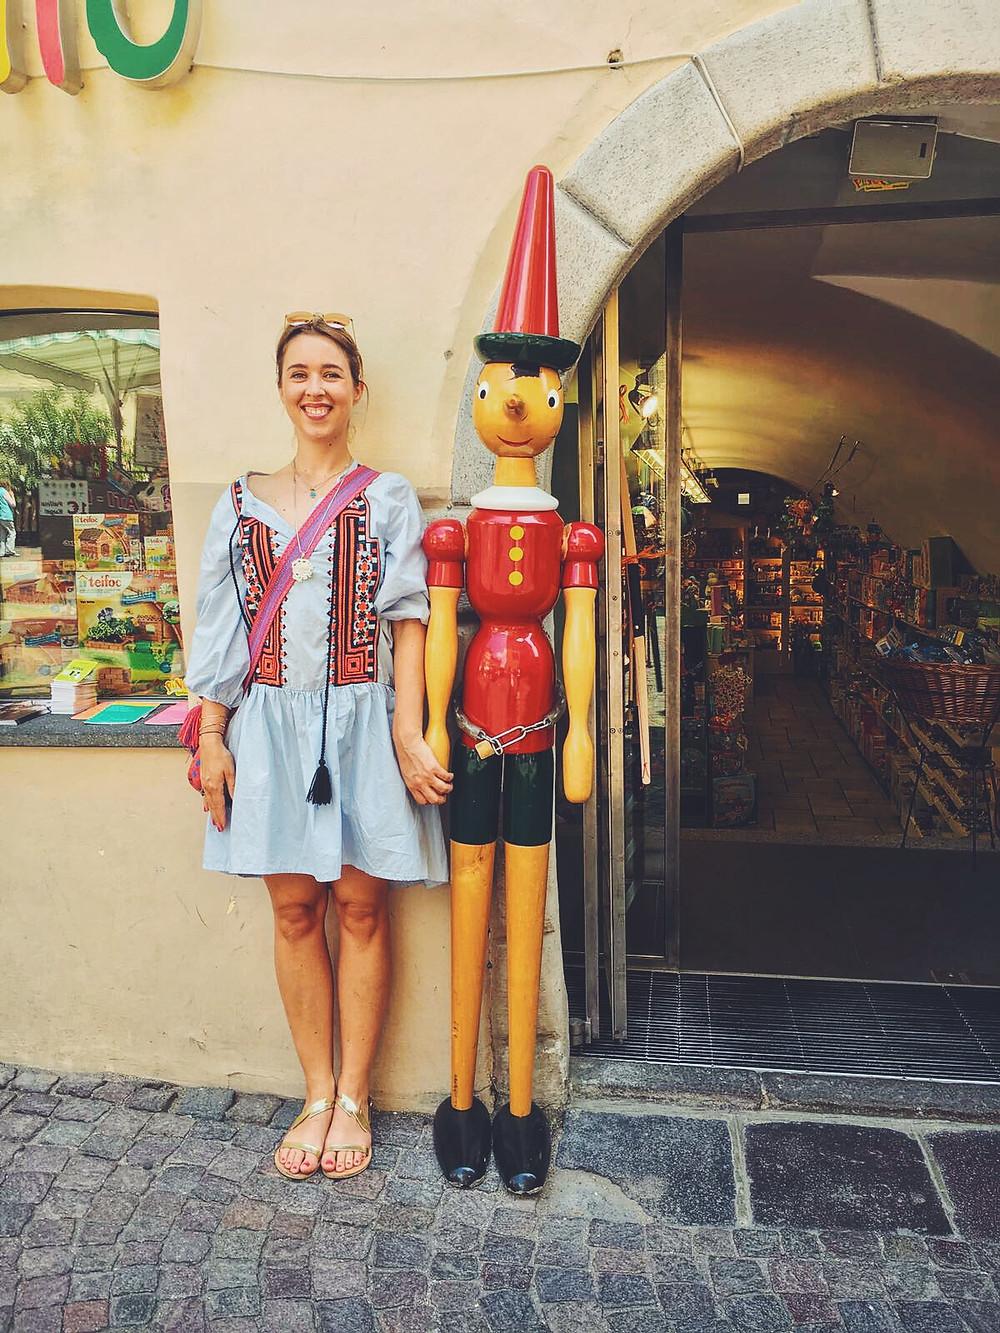 Bozen Tirol Pinocchio